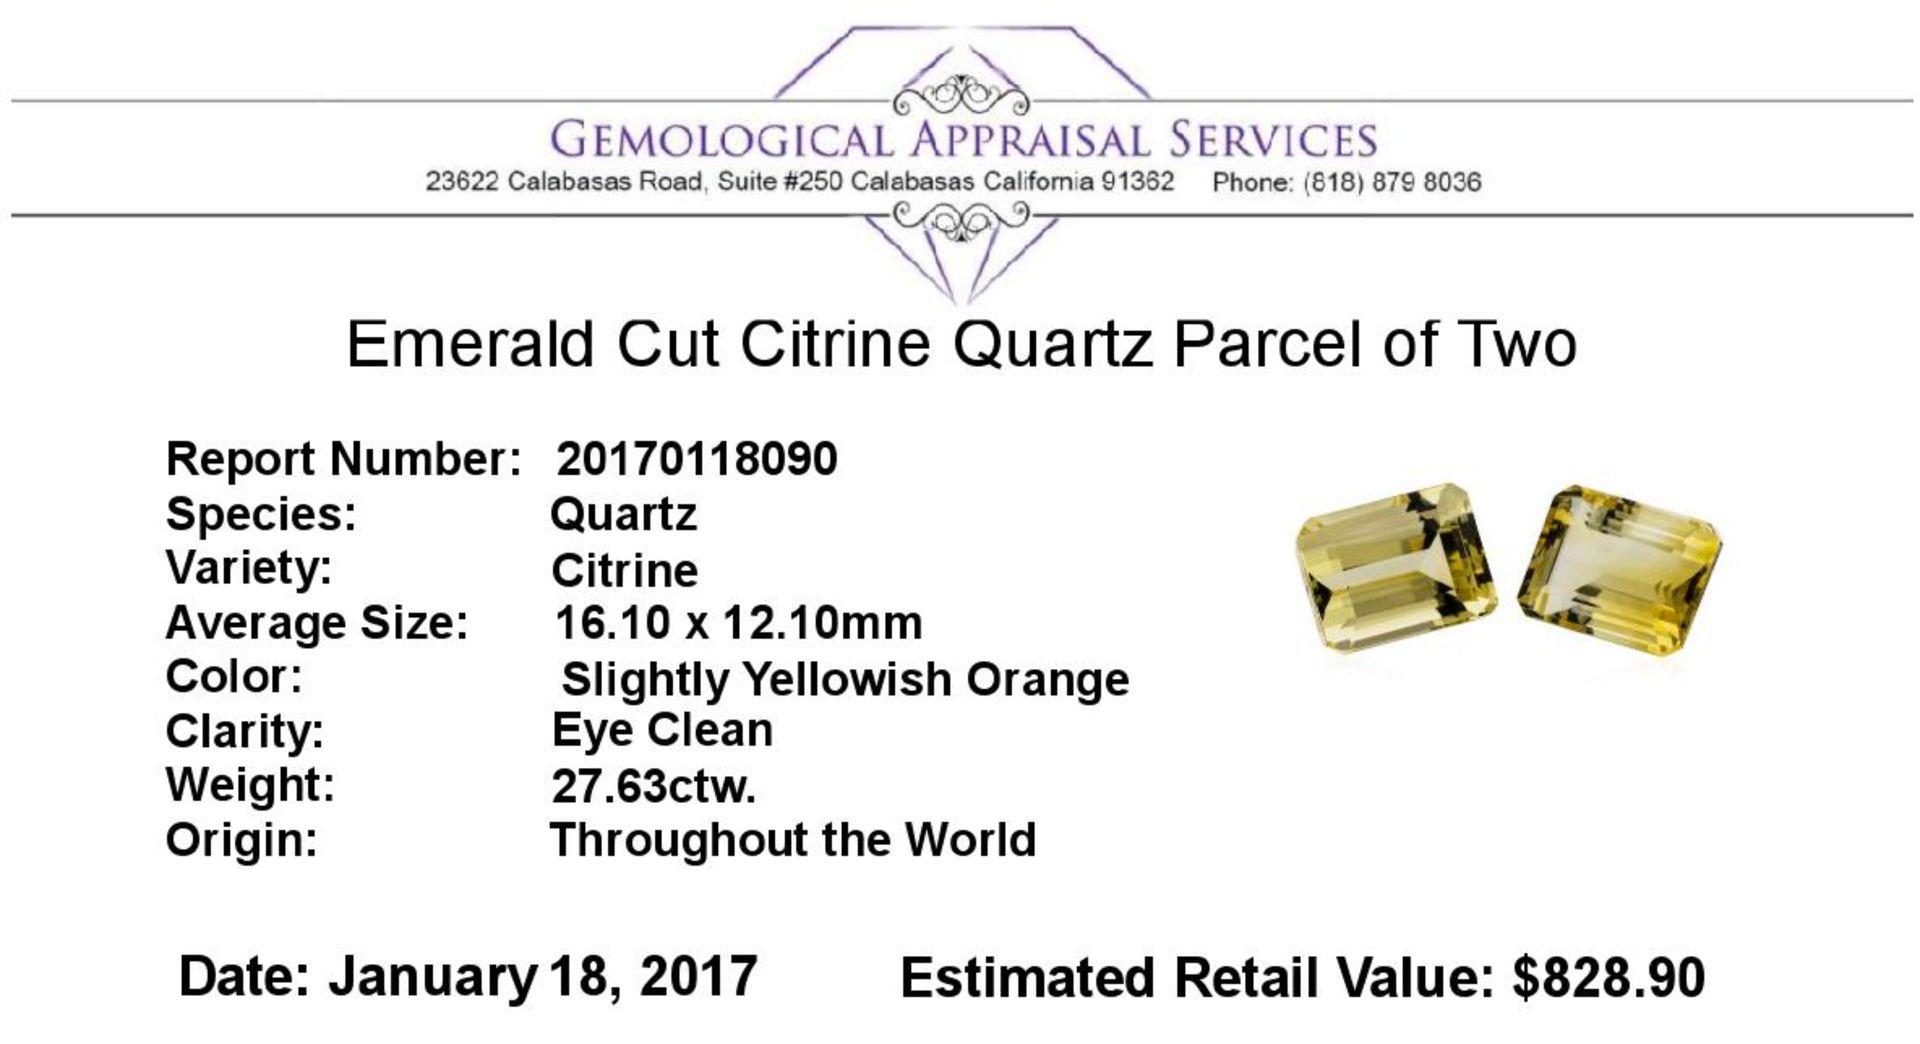 27.63ctw.Natural Emerald Cut Citrine Quartz Parcel of Two - Image 3 of 3